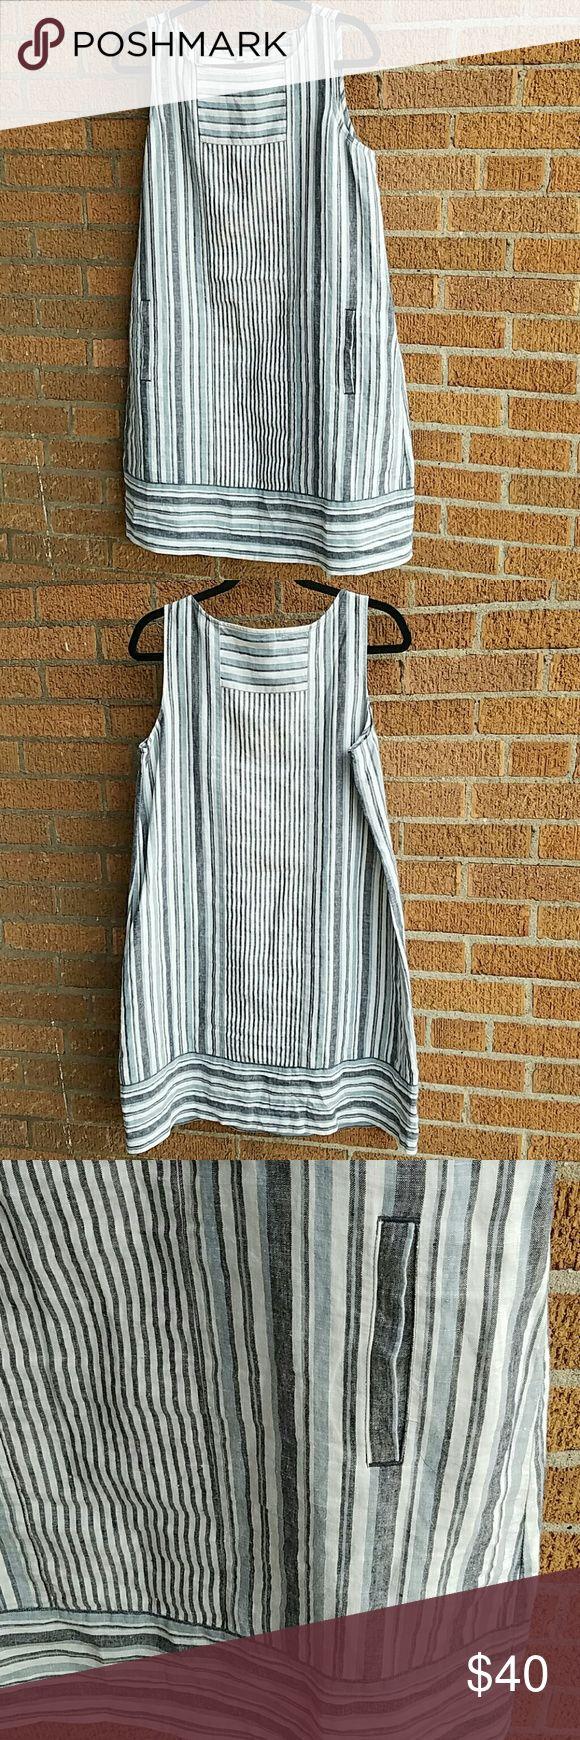 Striped linen J Jill sack dress with pockets Comfy blue gray white striped sleeveless dress with pockets.  Linen, size medium.  Item #3035- 1498 j jill Dresses Midi